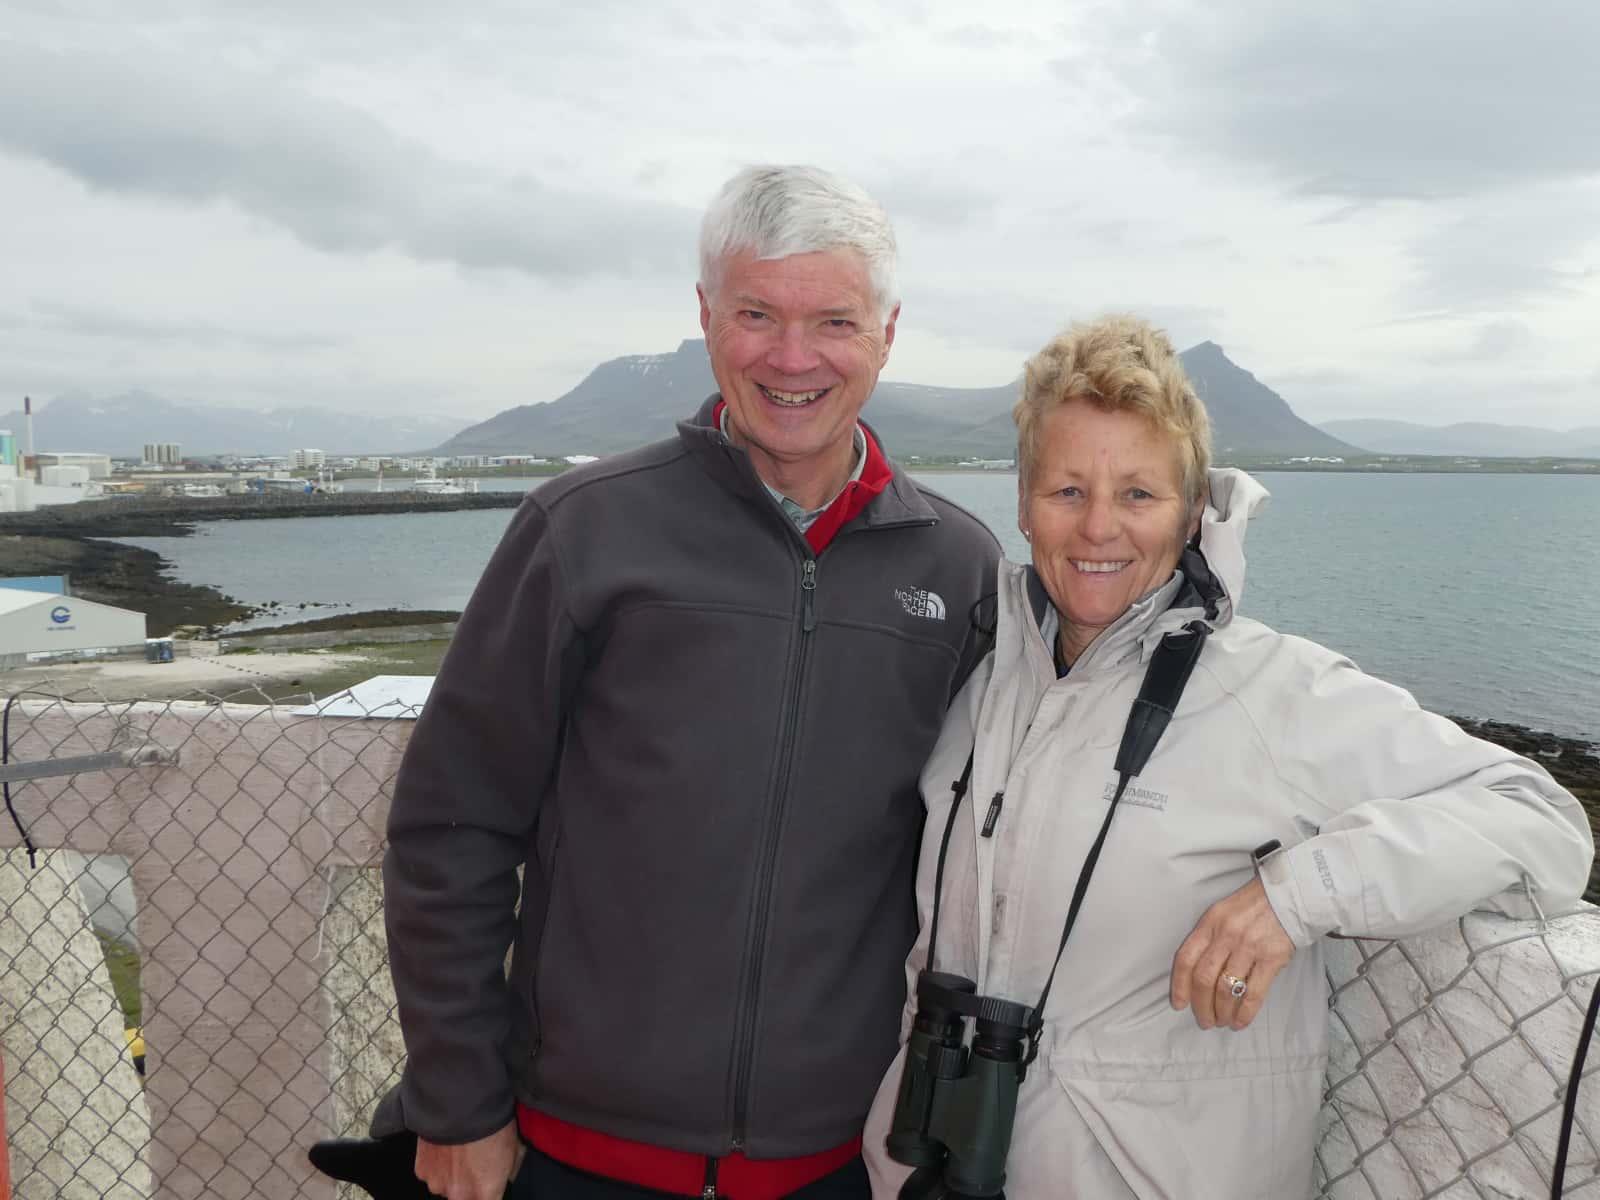 Debra & Ian from Perth, Western Australia, Australia